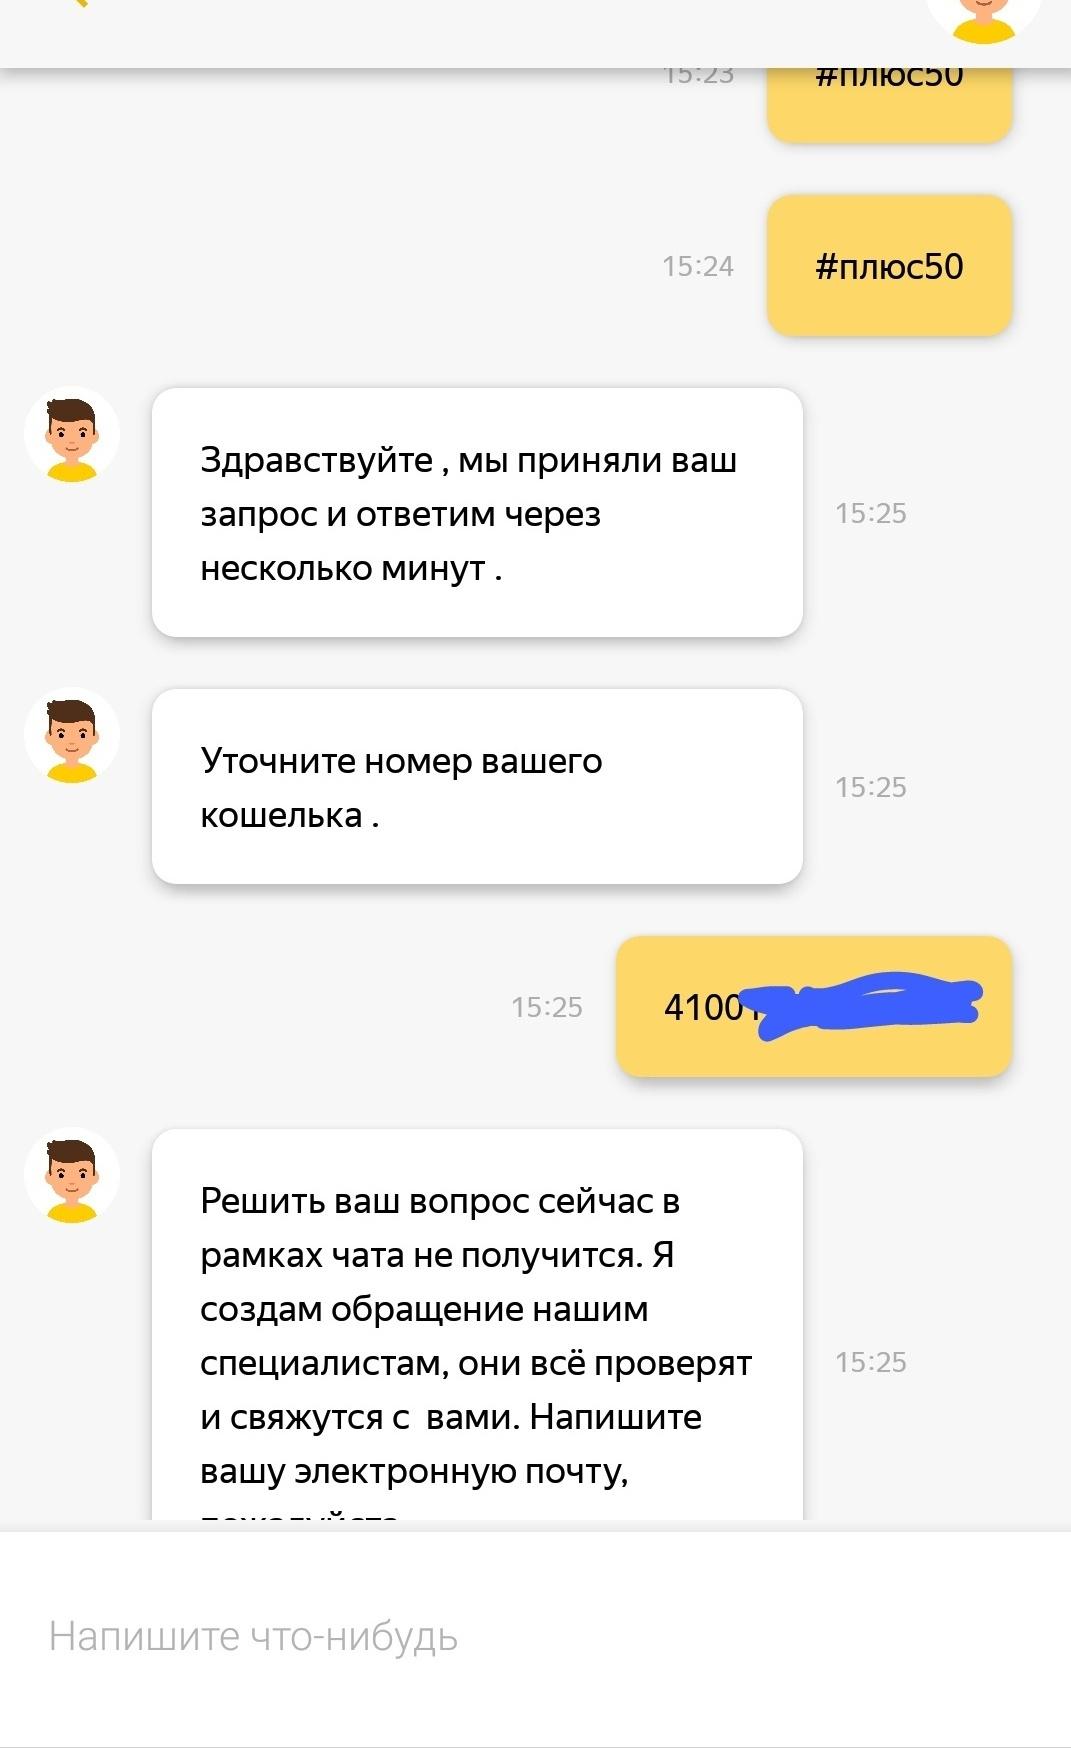 IMG_20190808_153058.jpg